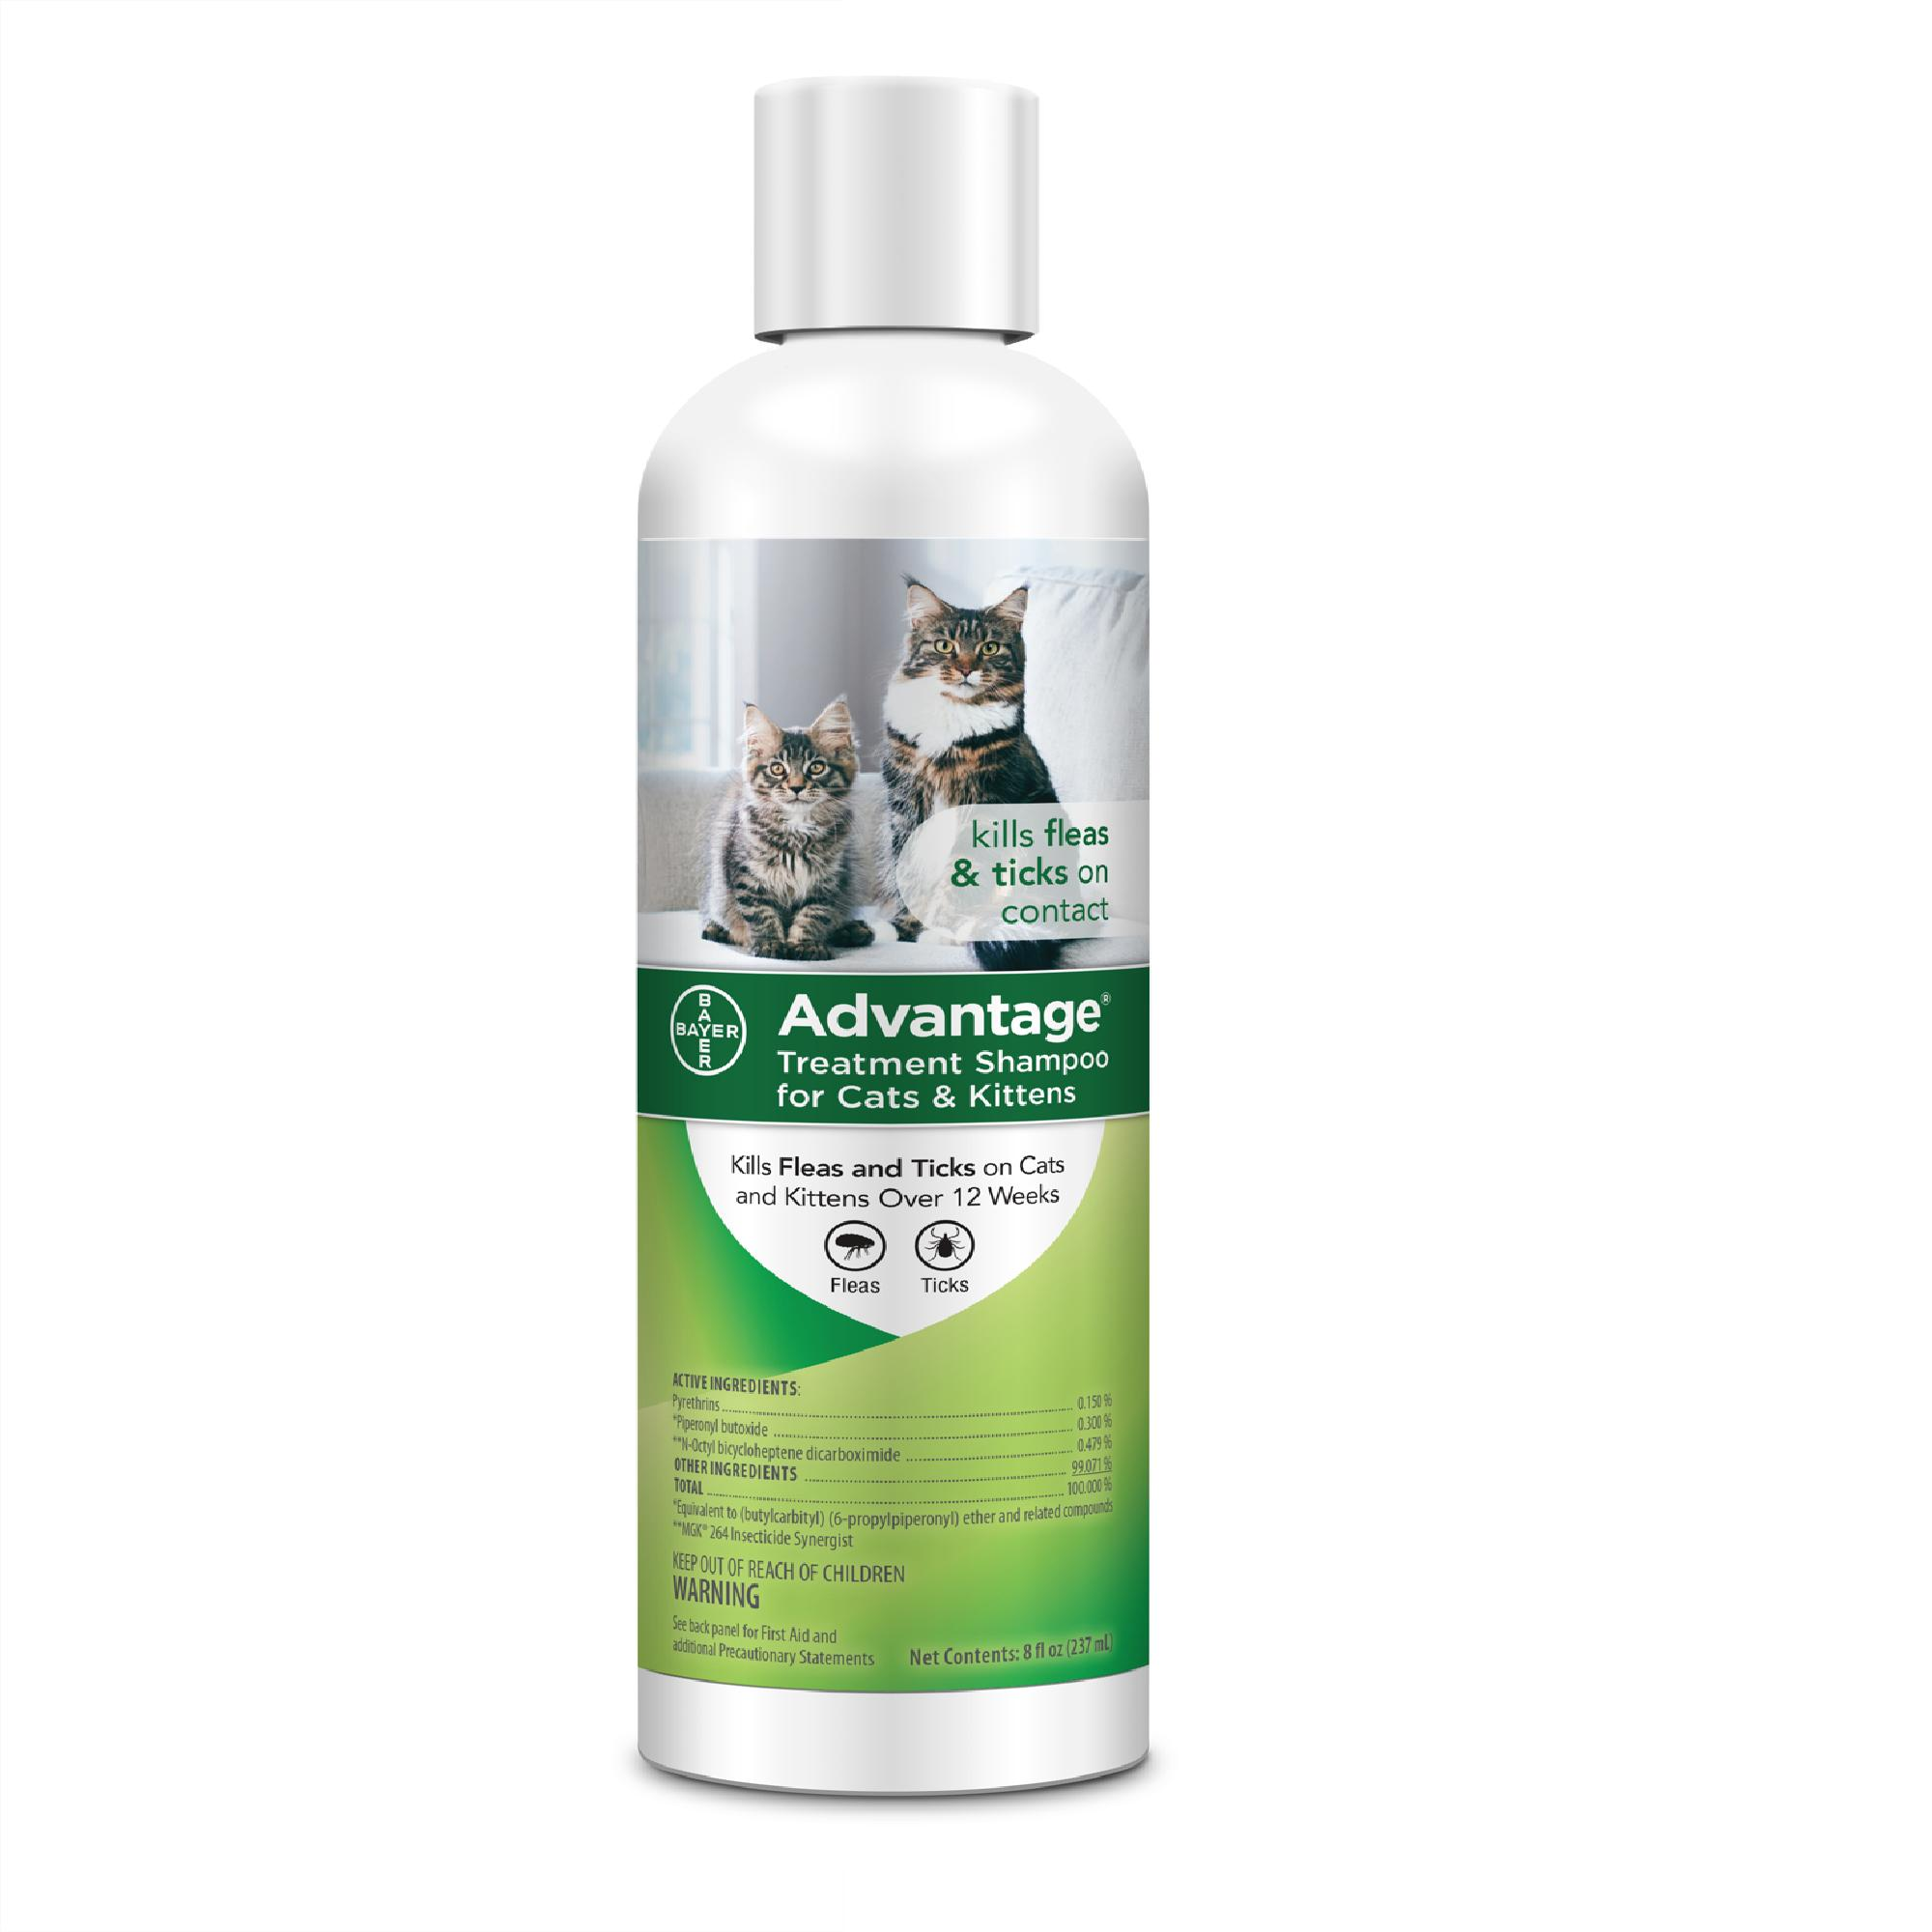 Advantage Flea & Tick Treatment Shampoo for Cats & Kittens, 8-oz